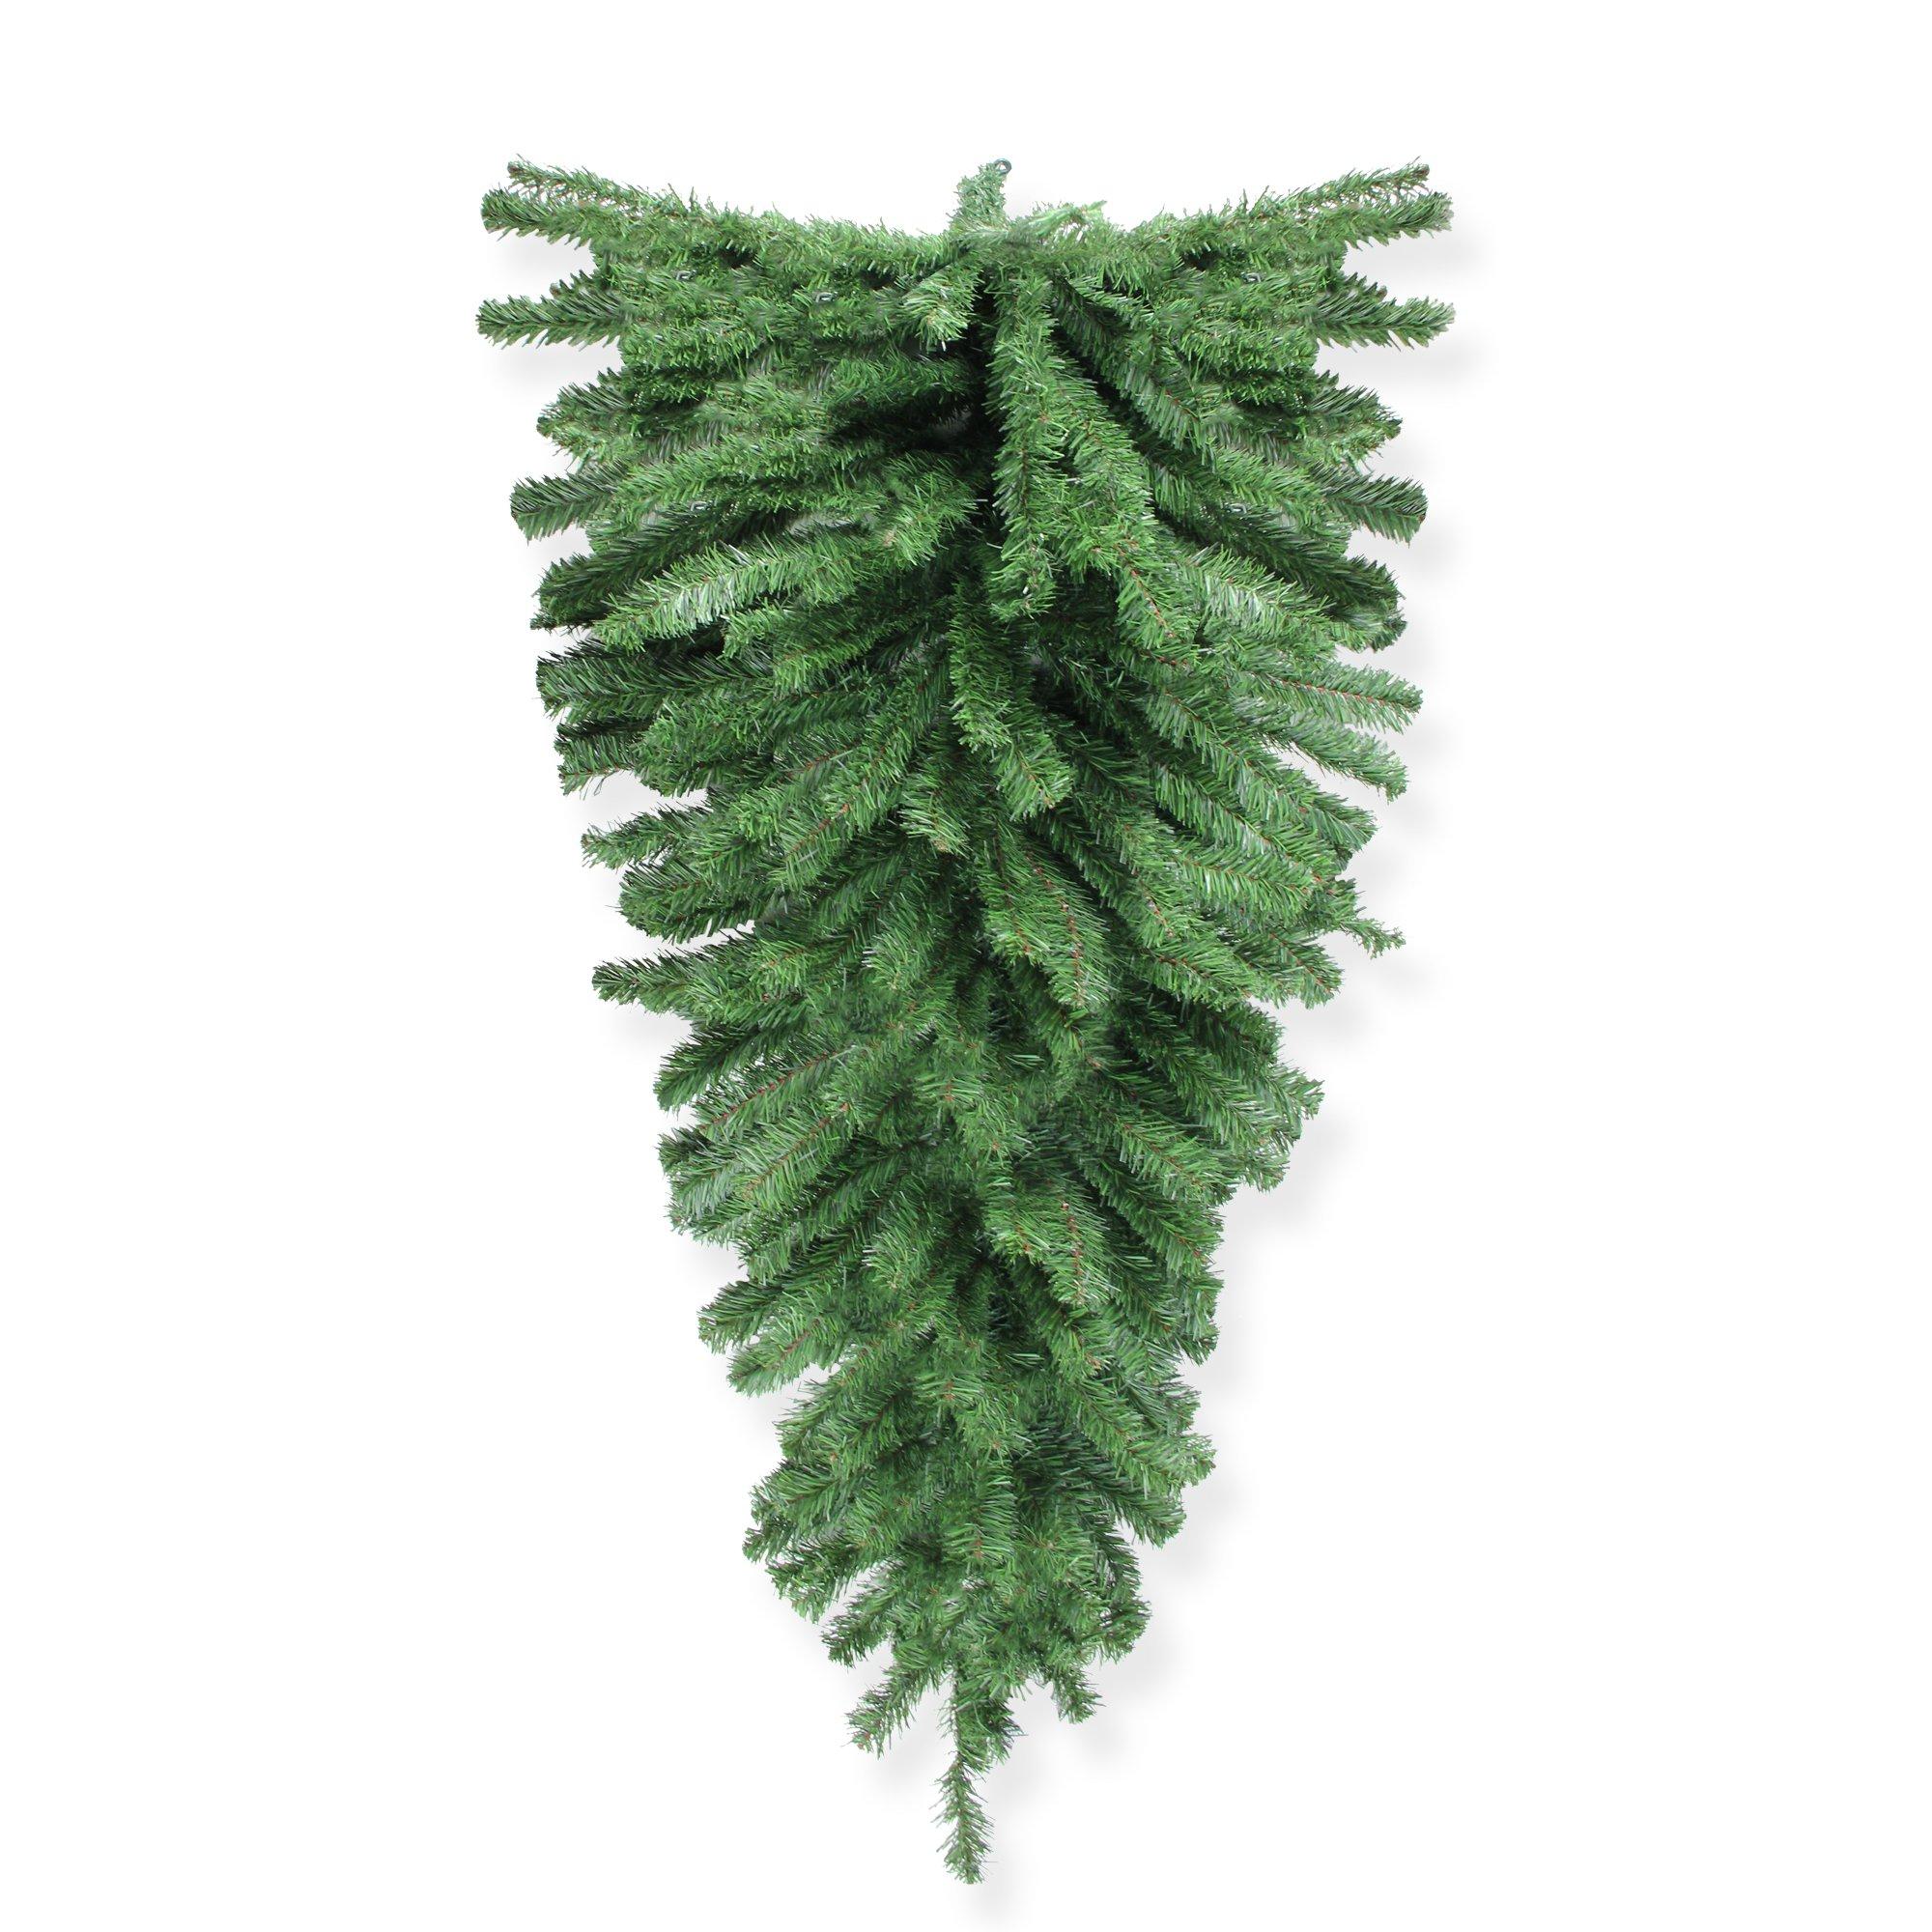 Northlight 48'' Canadian Pine Christmas Teardrop Swag - Unlit by Northlight